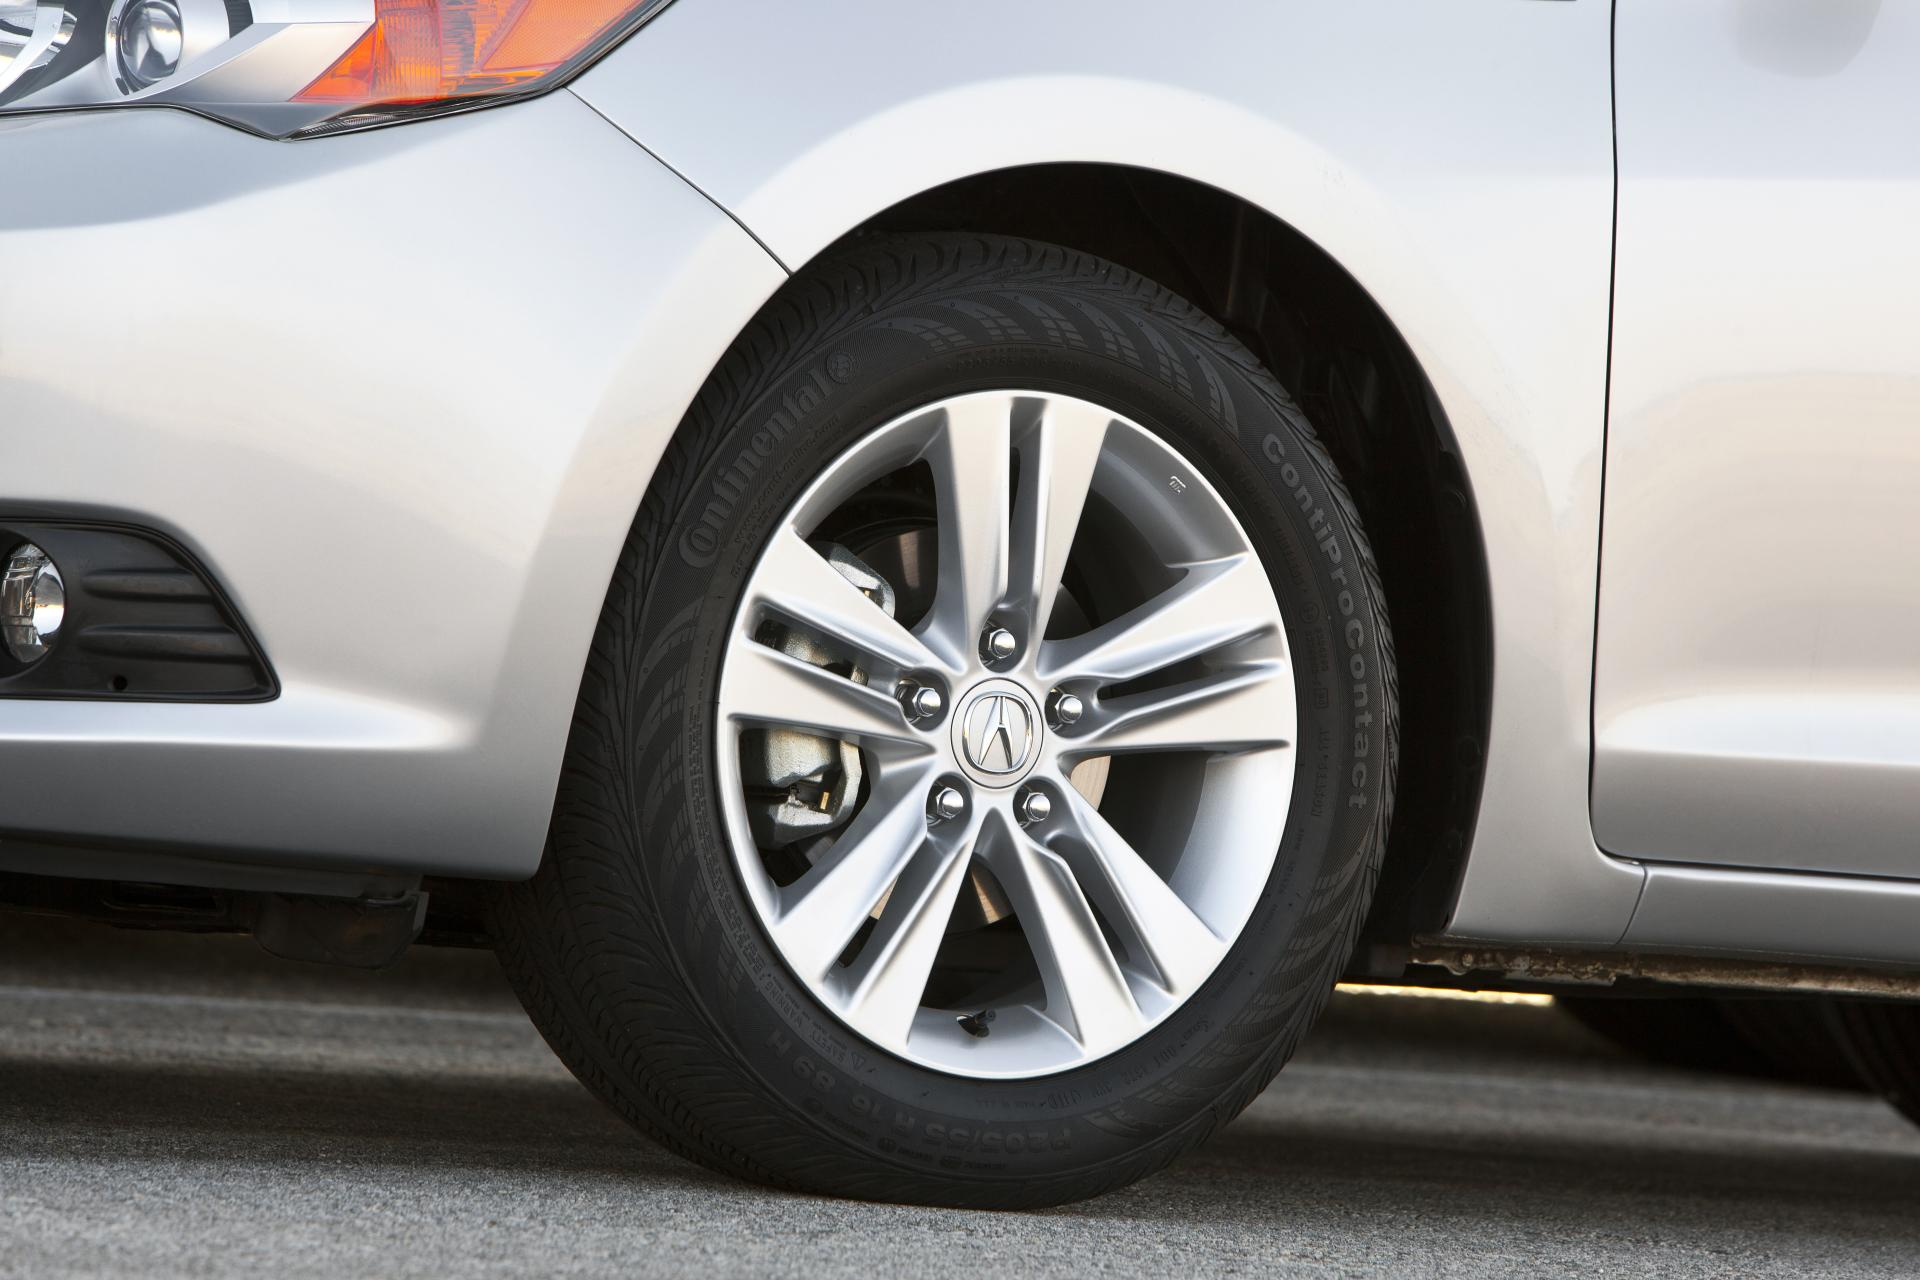 Innovative 2013 Acura ILX Car Installation [VIDEO]